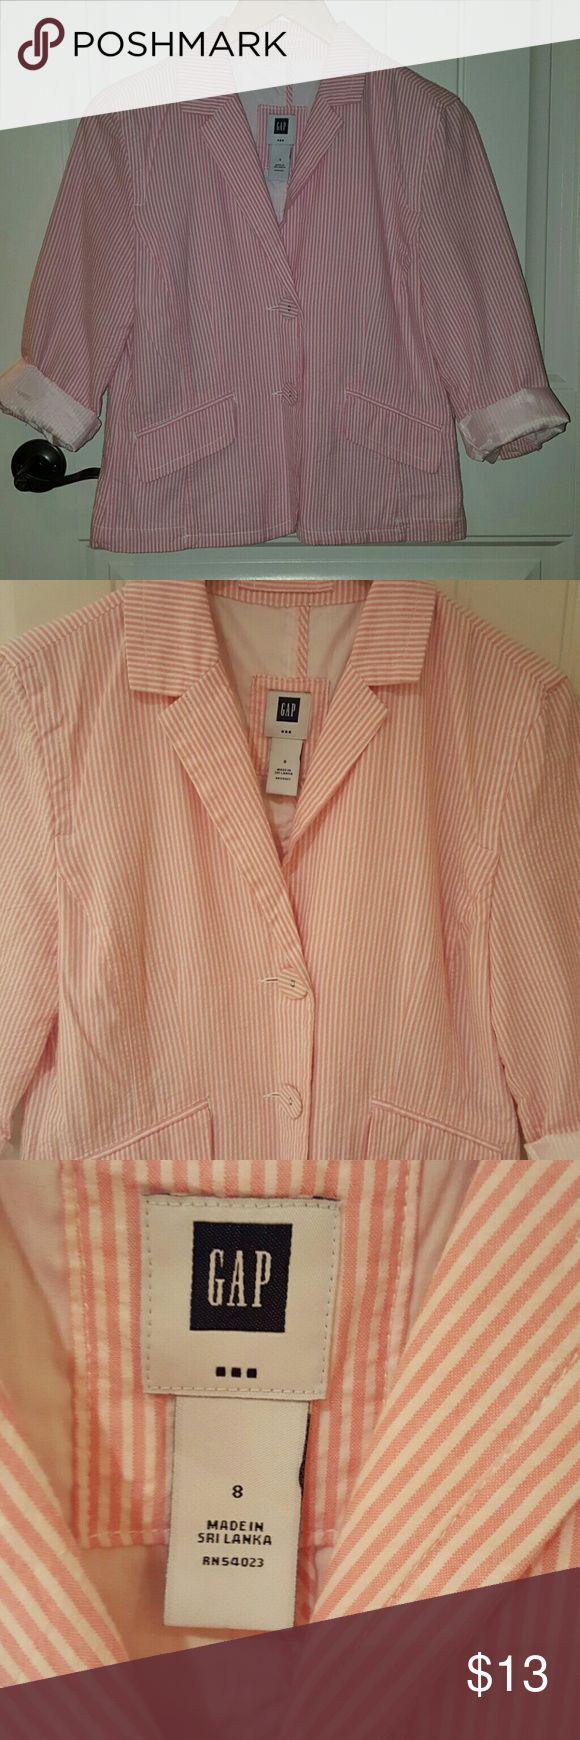 Pink and White Seersucker Jacket Size 8 3/4 length sleeves  GAP 30 percent off bundles GAP Jackets & Coats Blazers